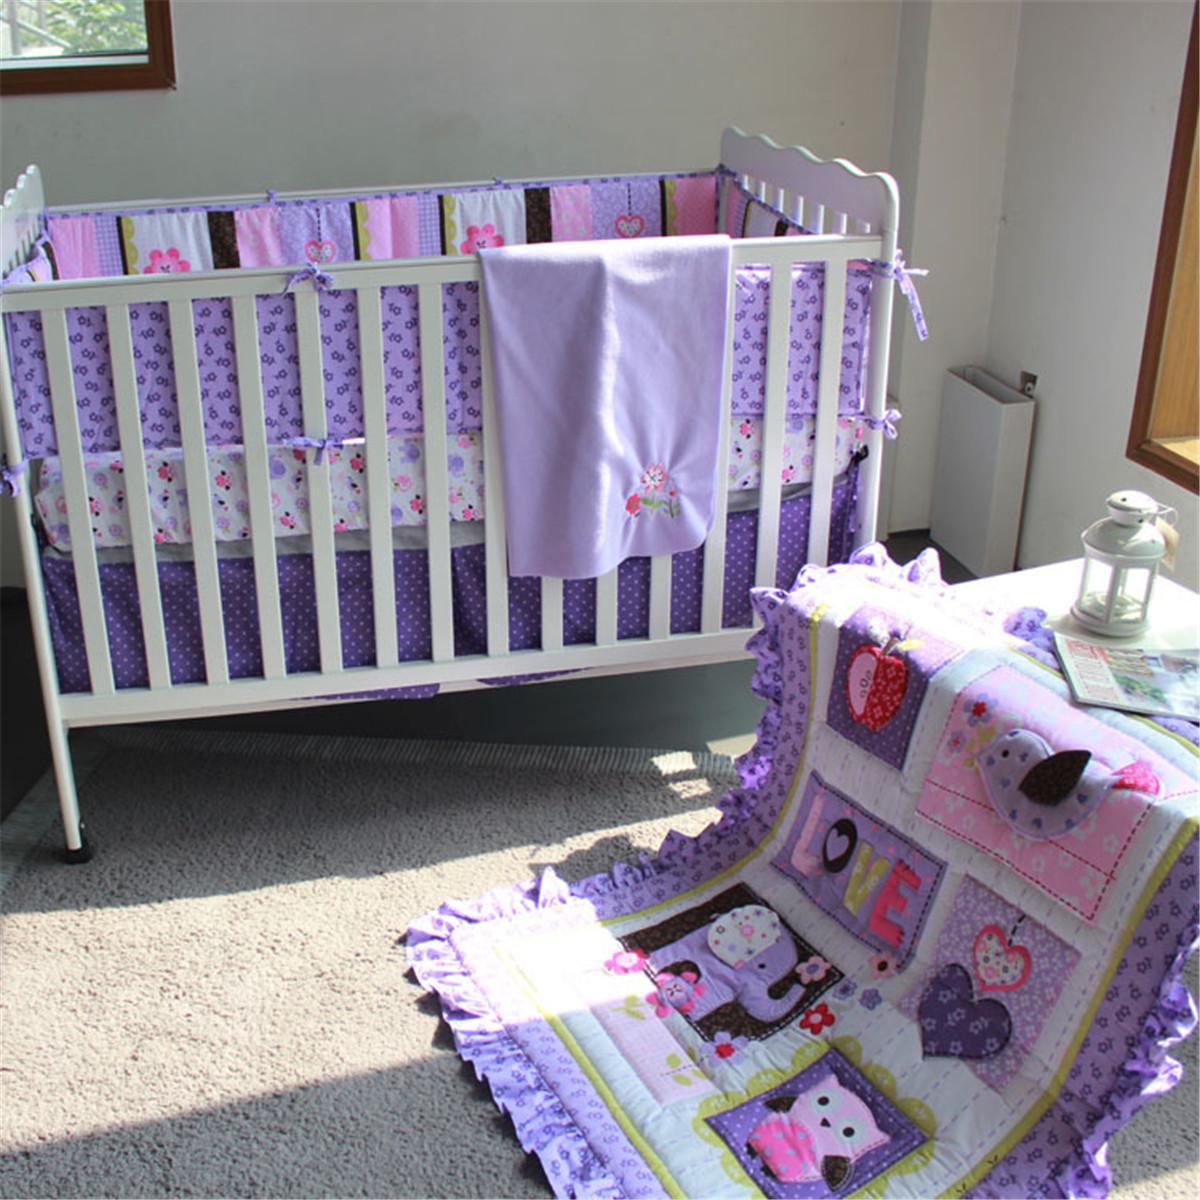 8 Pcs/set Purple Elephant Cotton Polyester Baby Bedding Set Crib Cot Quilt Bumper Sheet Dust Ruffle Bumper Pads Sheets8 Pcs/set Purple Elephant Cotton Polyester Baby Bedding Set Crib Cot Quilt Bumper Sheet Dust Ruffle Bumper Pads Sheets